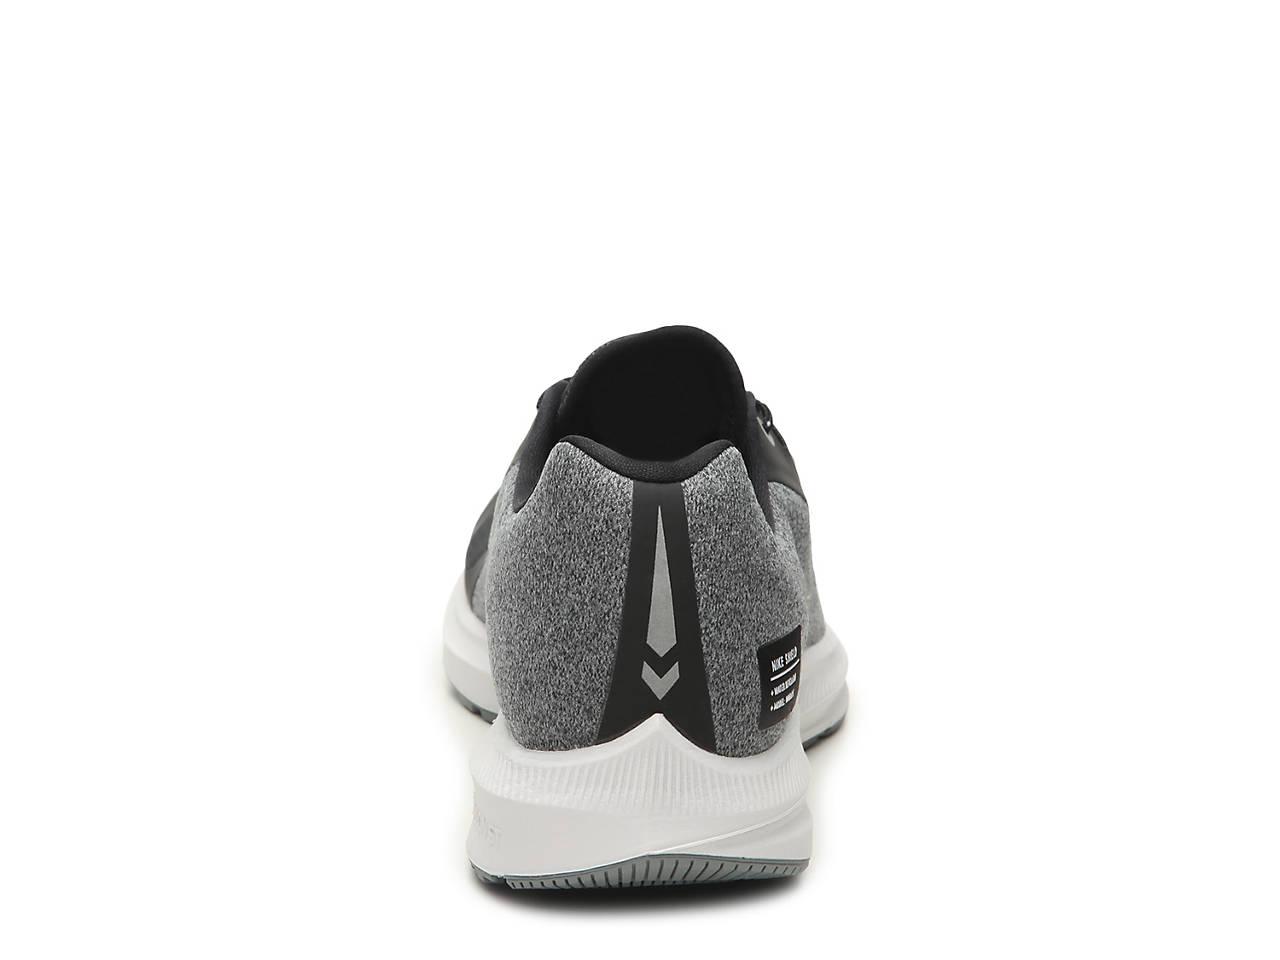 34c641f1685 Nike Zoom Winflo 5 Shield Lightweight Running Shoe - Men s Men s ...